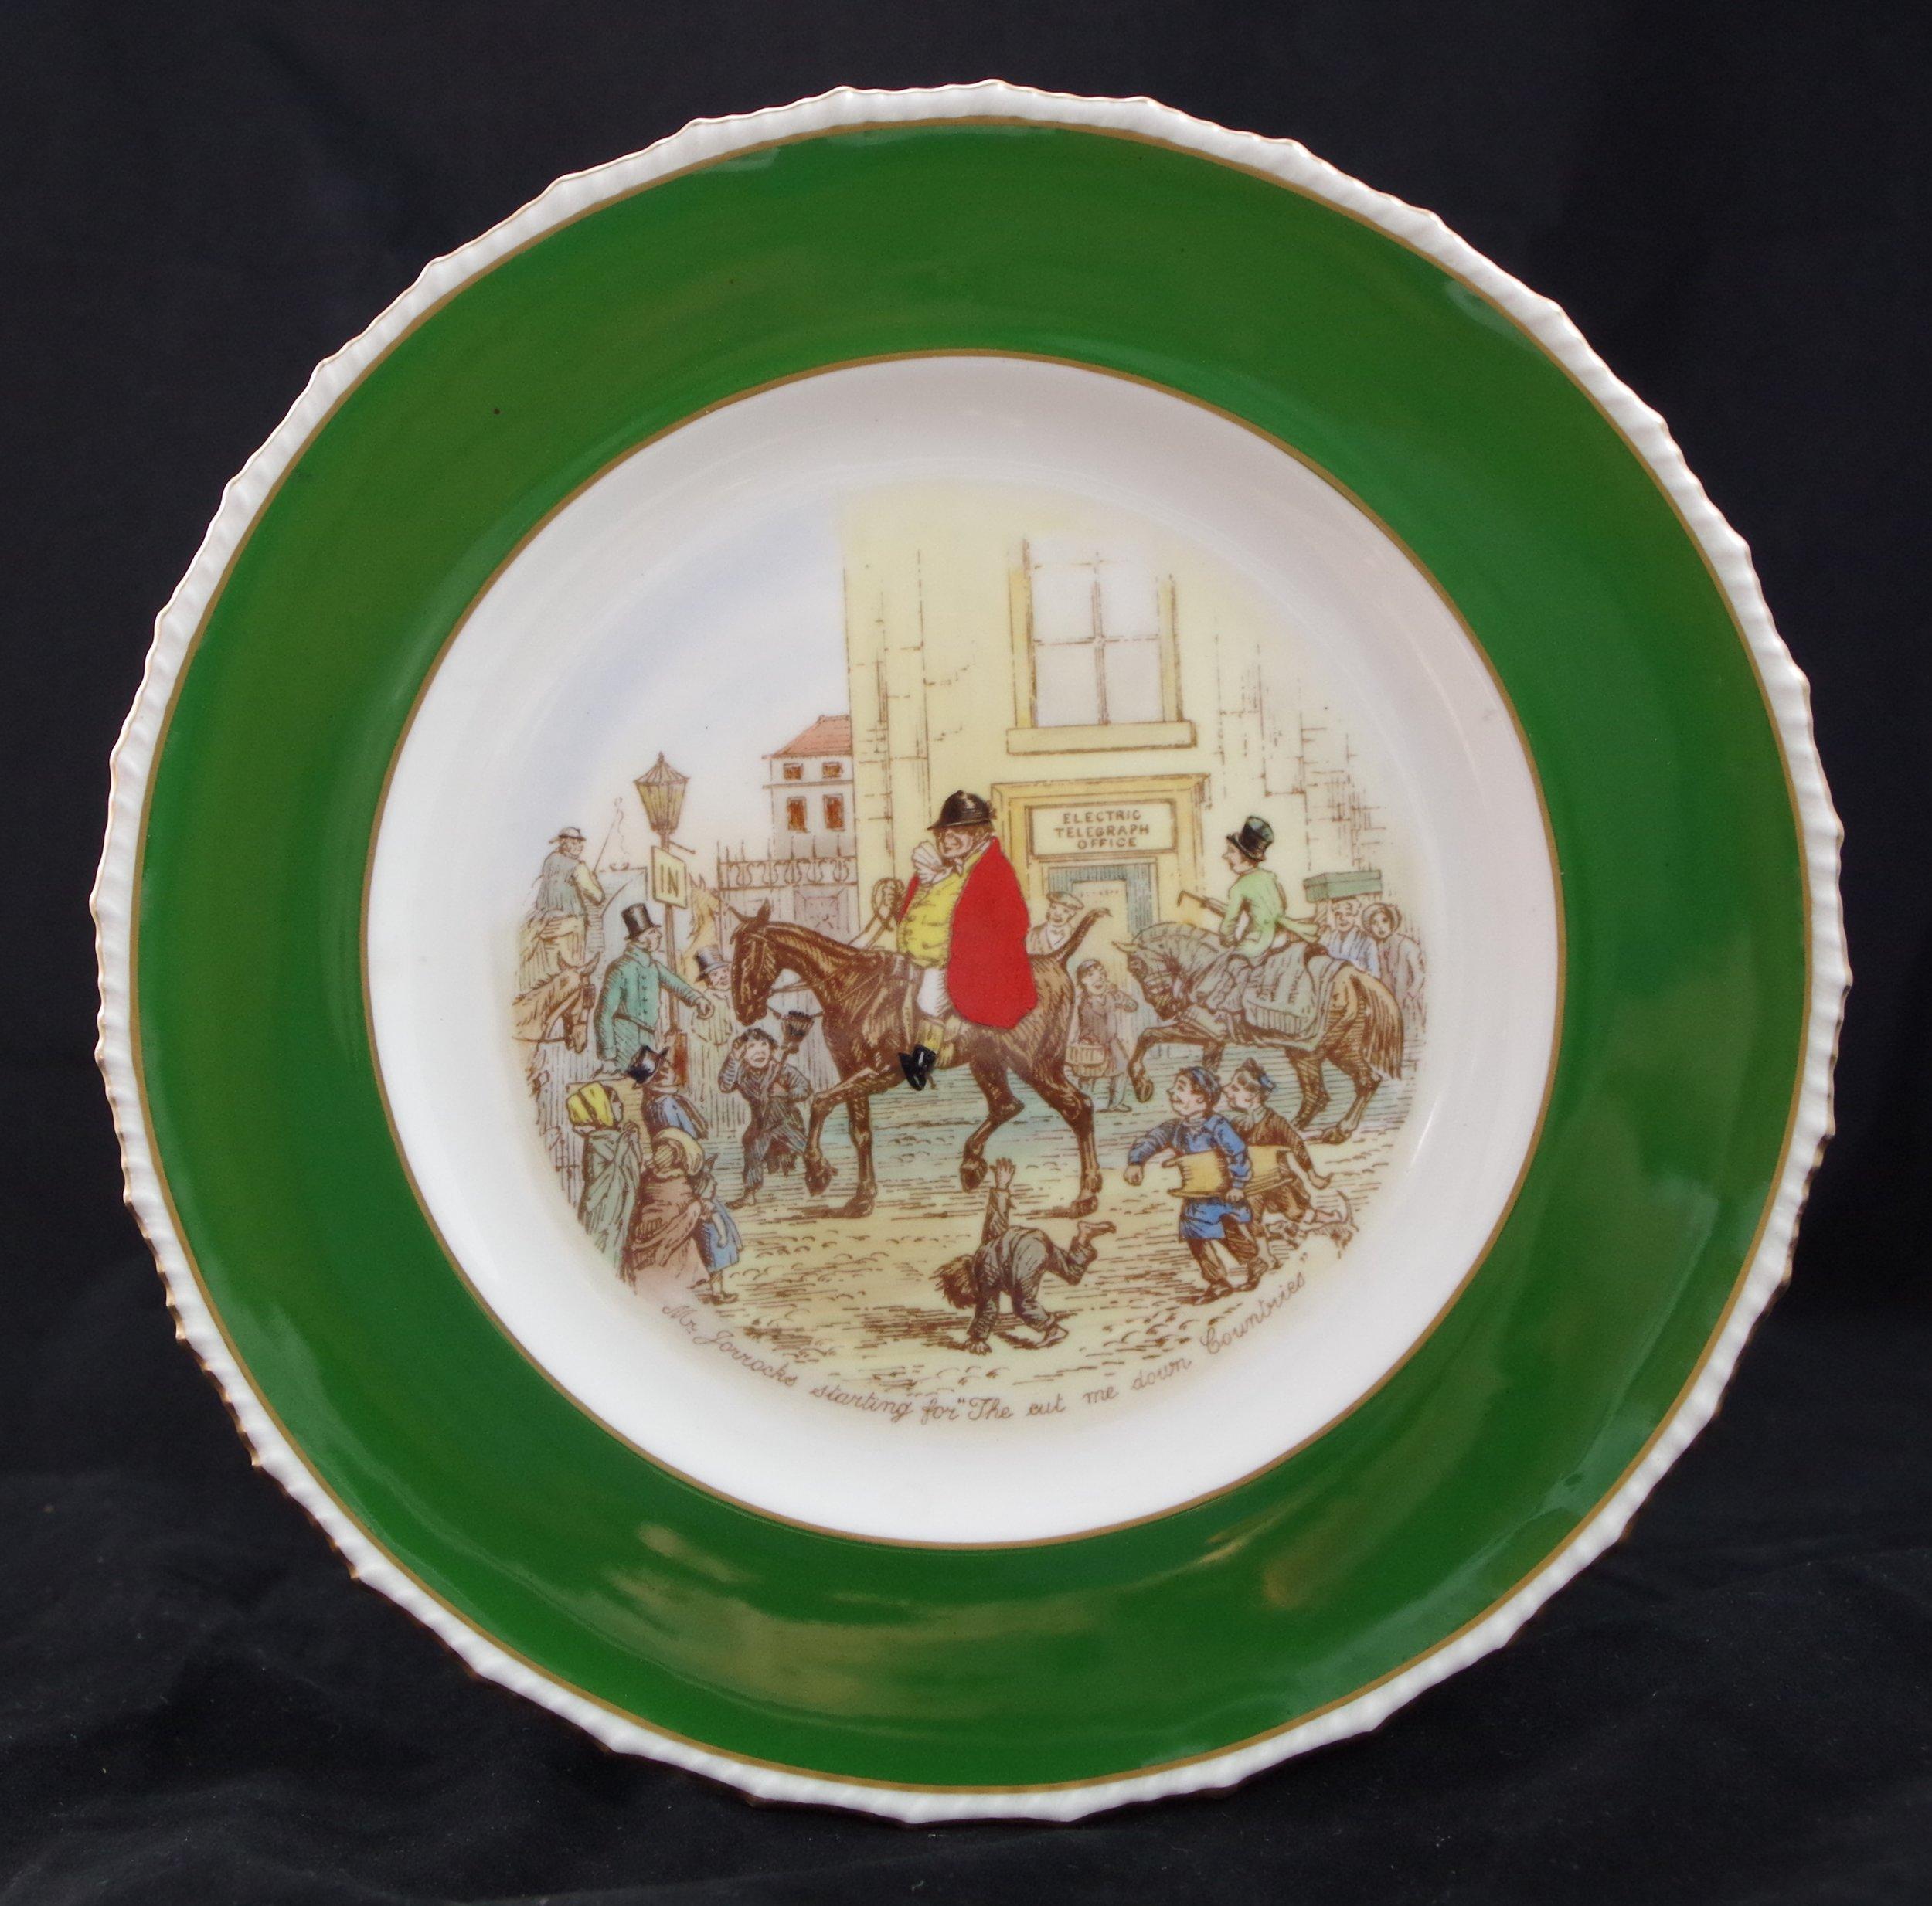 royal-crown-derby-stanhope-siam-green-ground-jorrocks-3